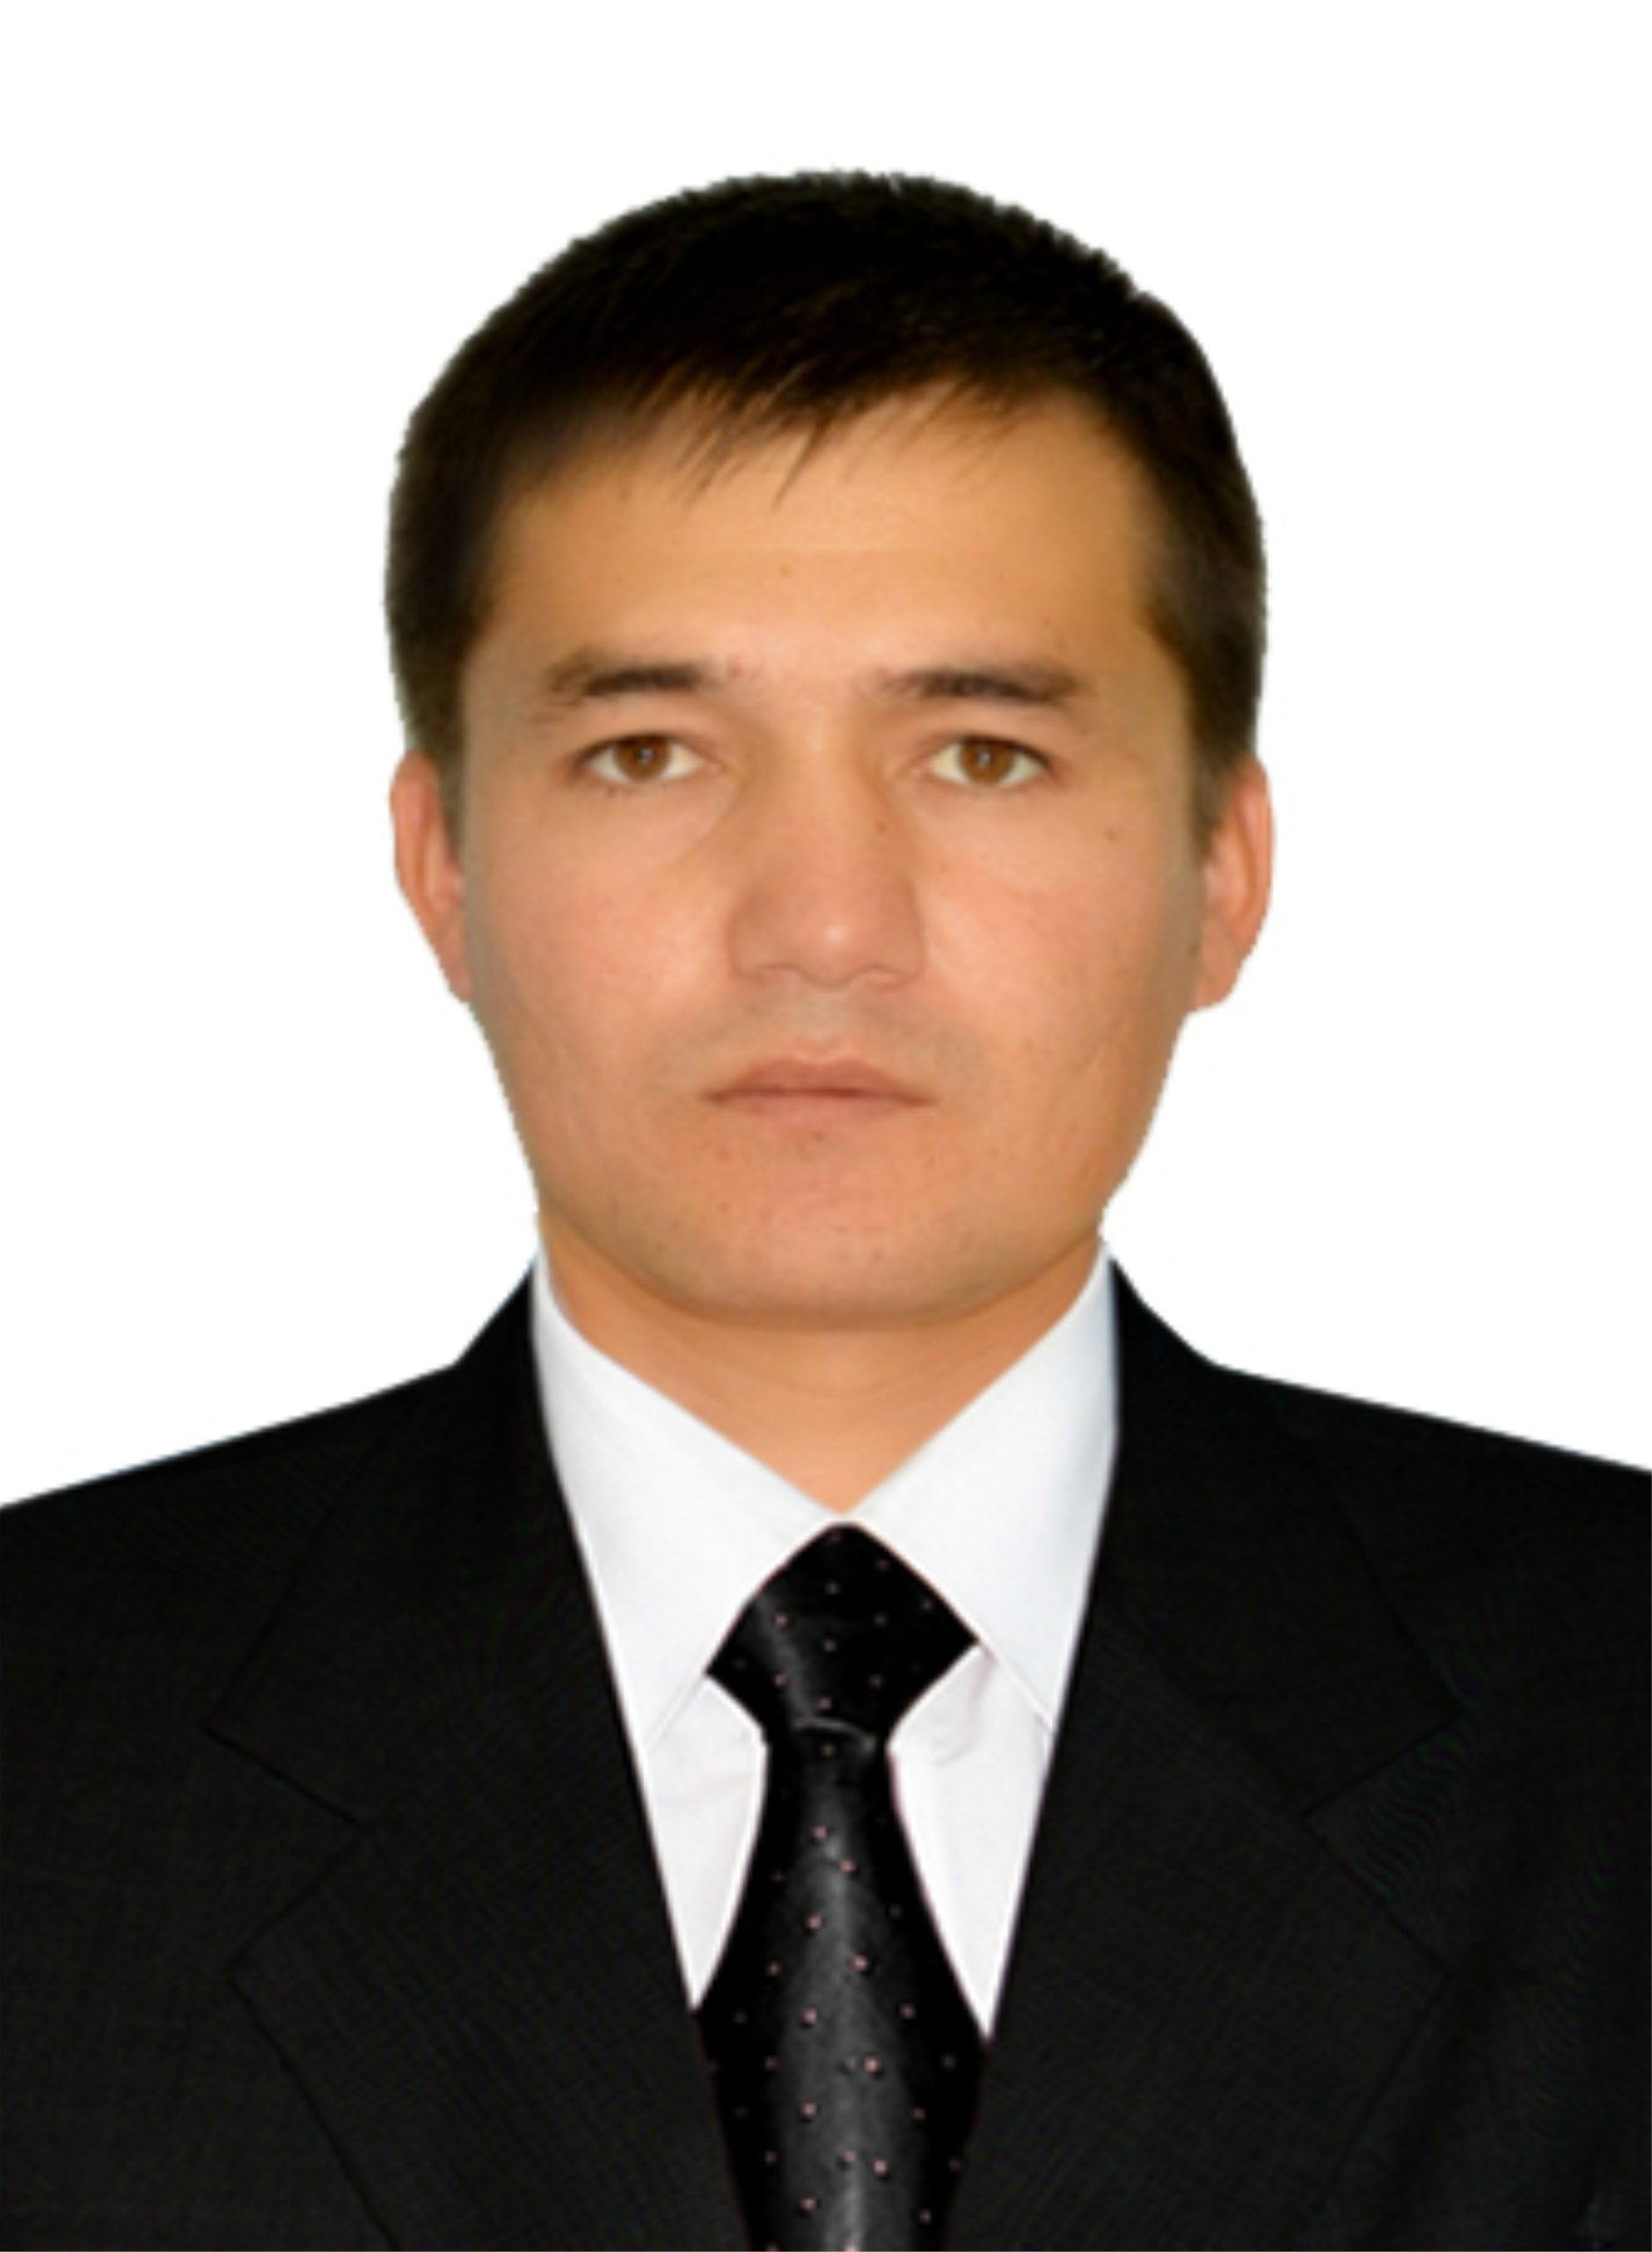 Risbekov Samandar Berdirasilovich